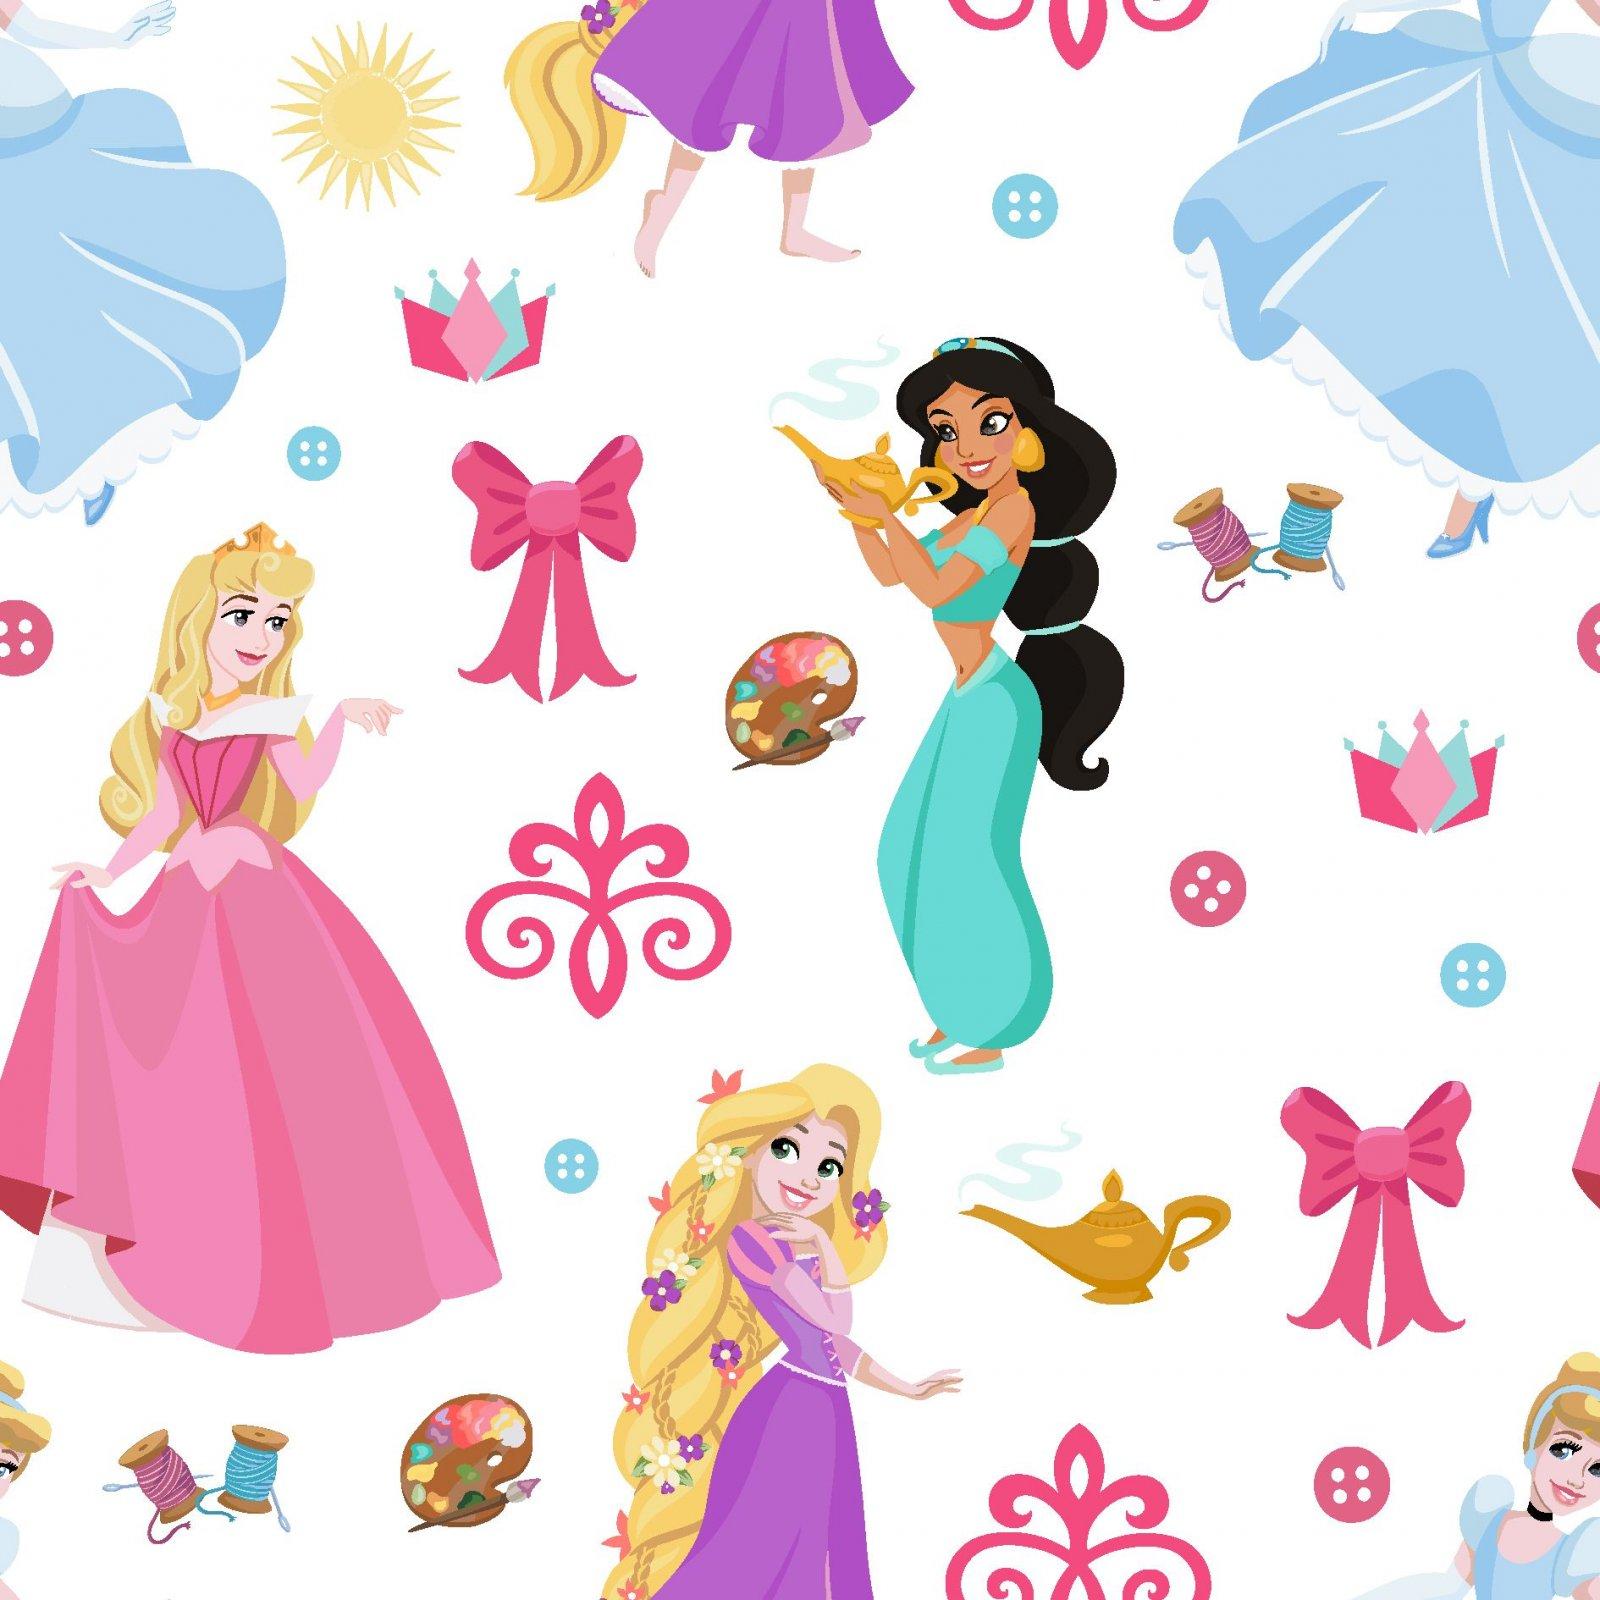 SC-Disney Ultimate Princess Celebration 73935-A620715 Princess Icon Packed